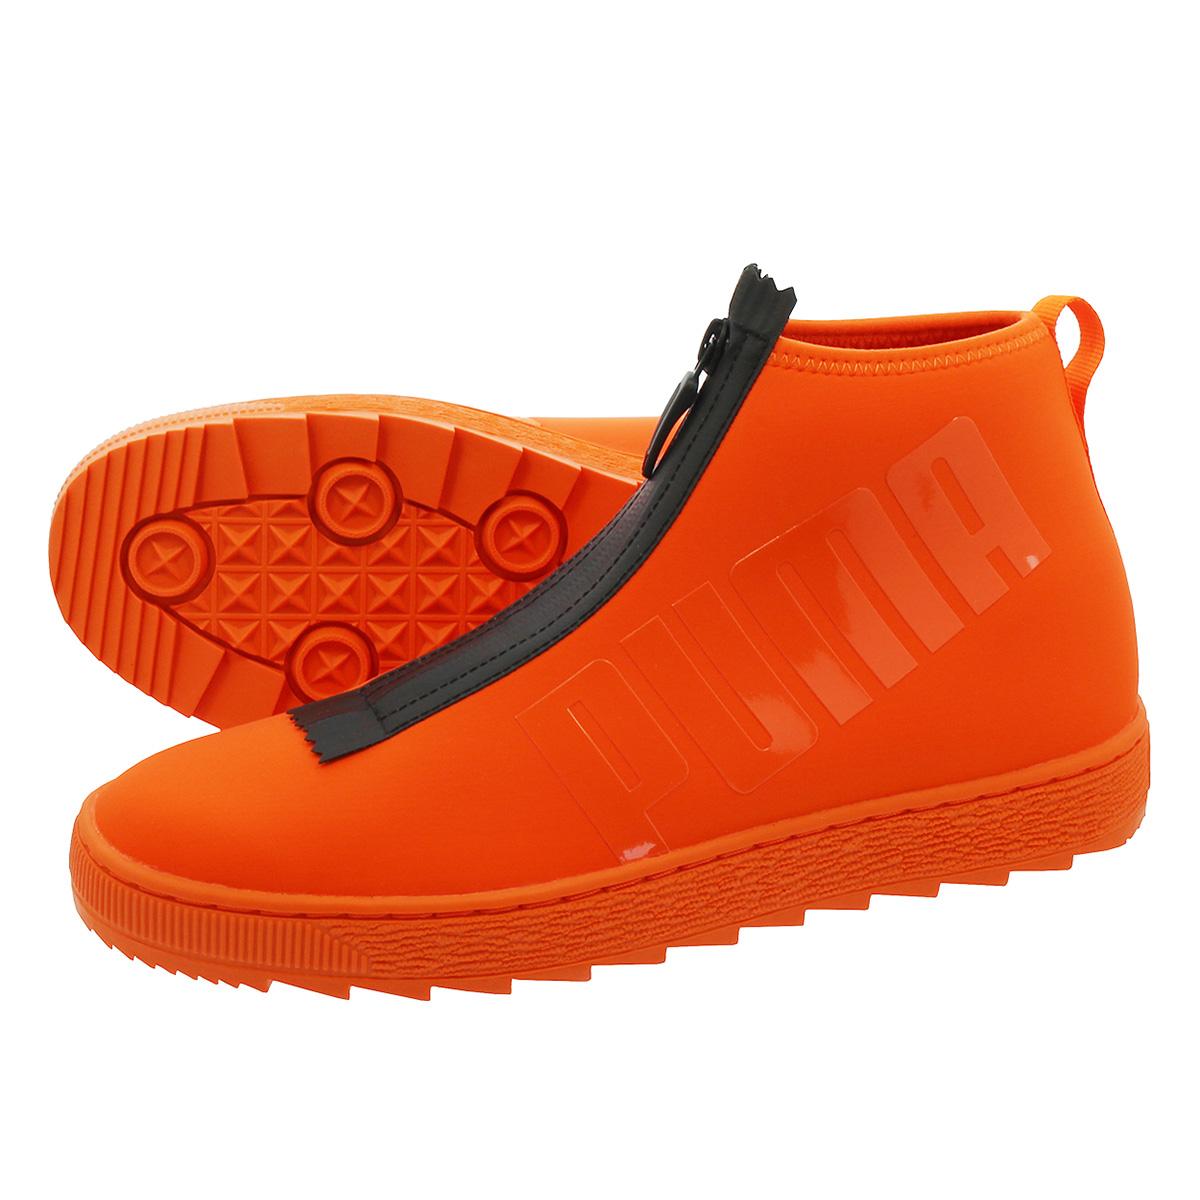 PUMA BASKET BOOT ANR プーマ バスケット ブーツ ANR SCARLET IBIS 366535-01